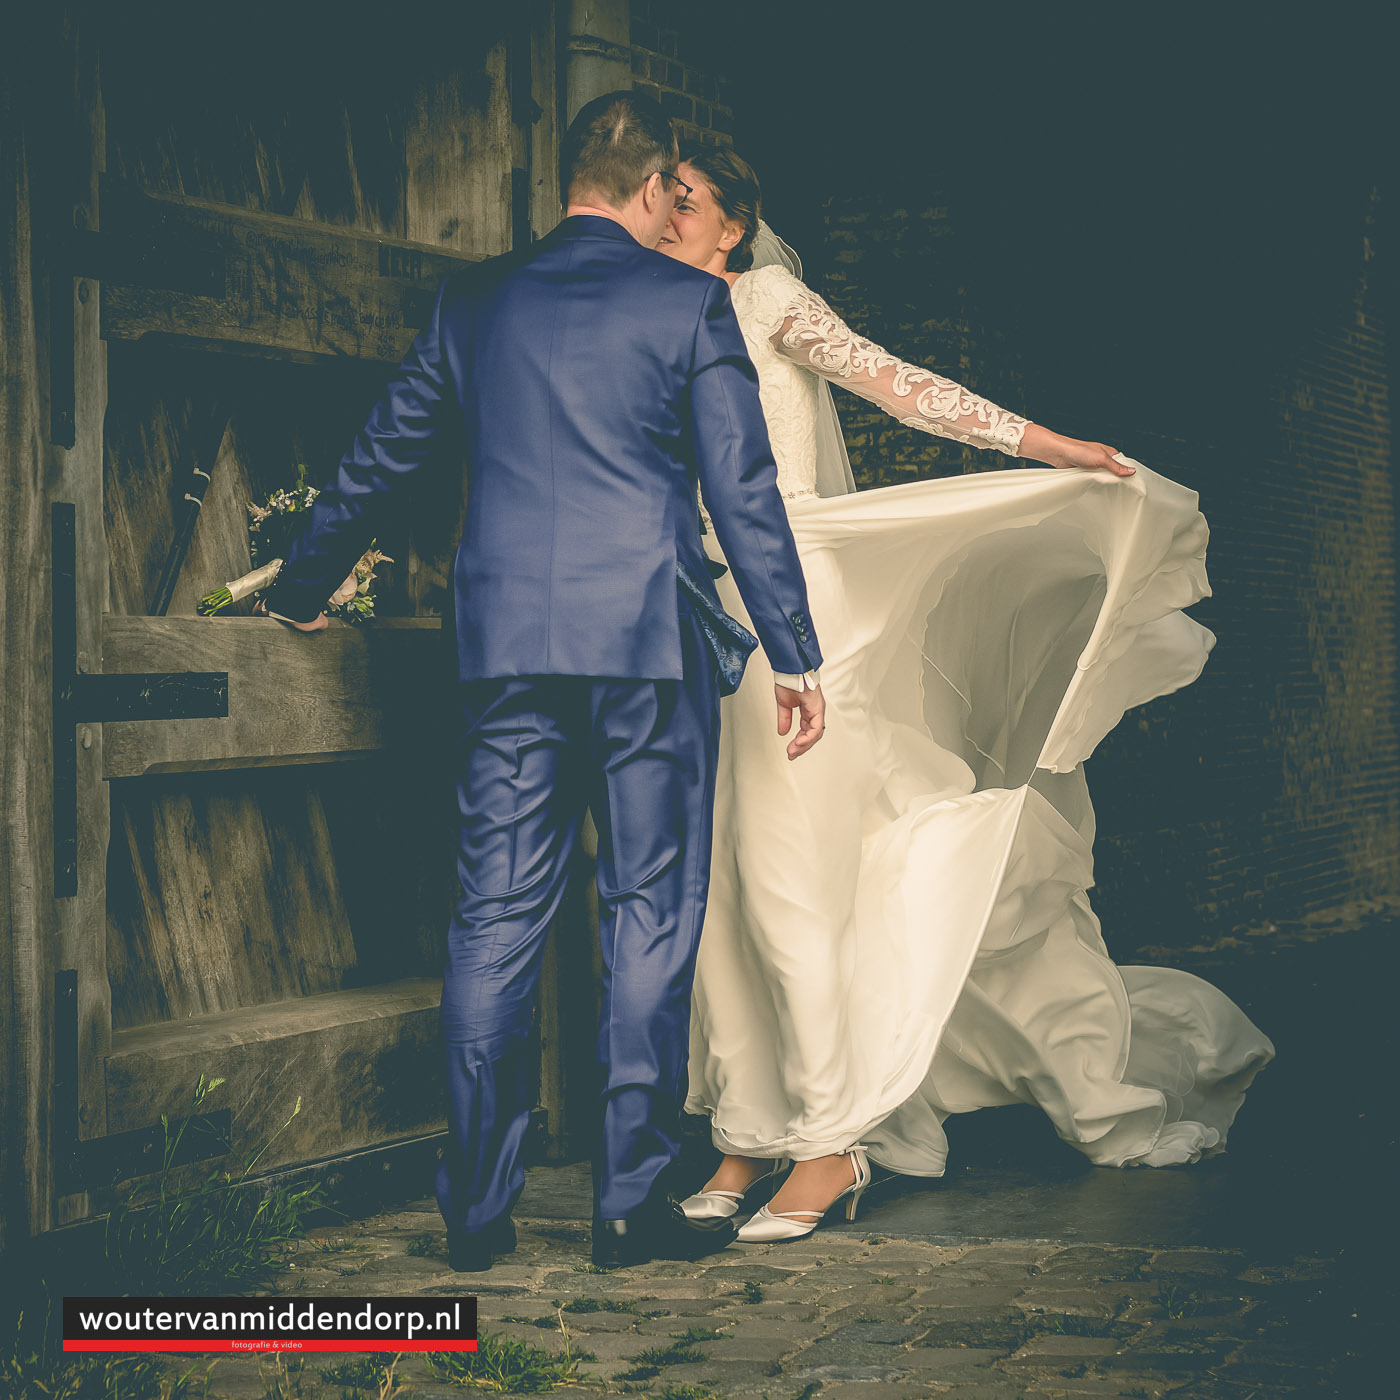 bruidsfotografie Wouter van Middendorp Uddel, Gorinchem, Ridderkerk-14